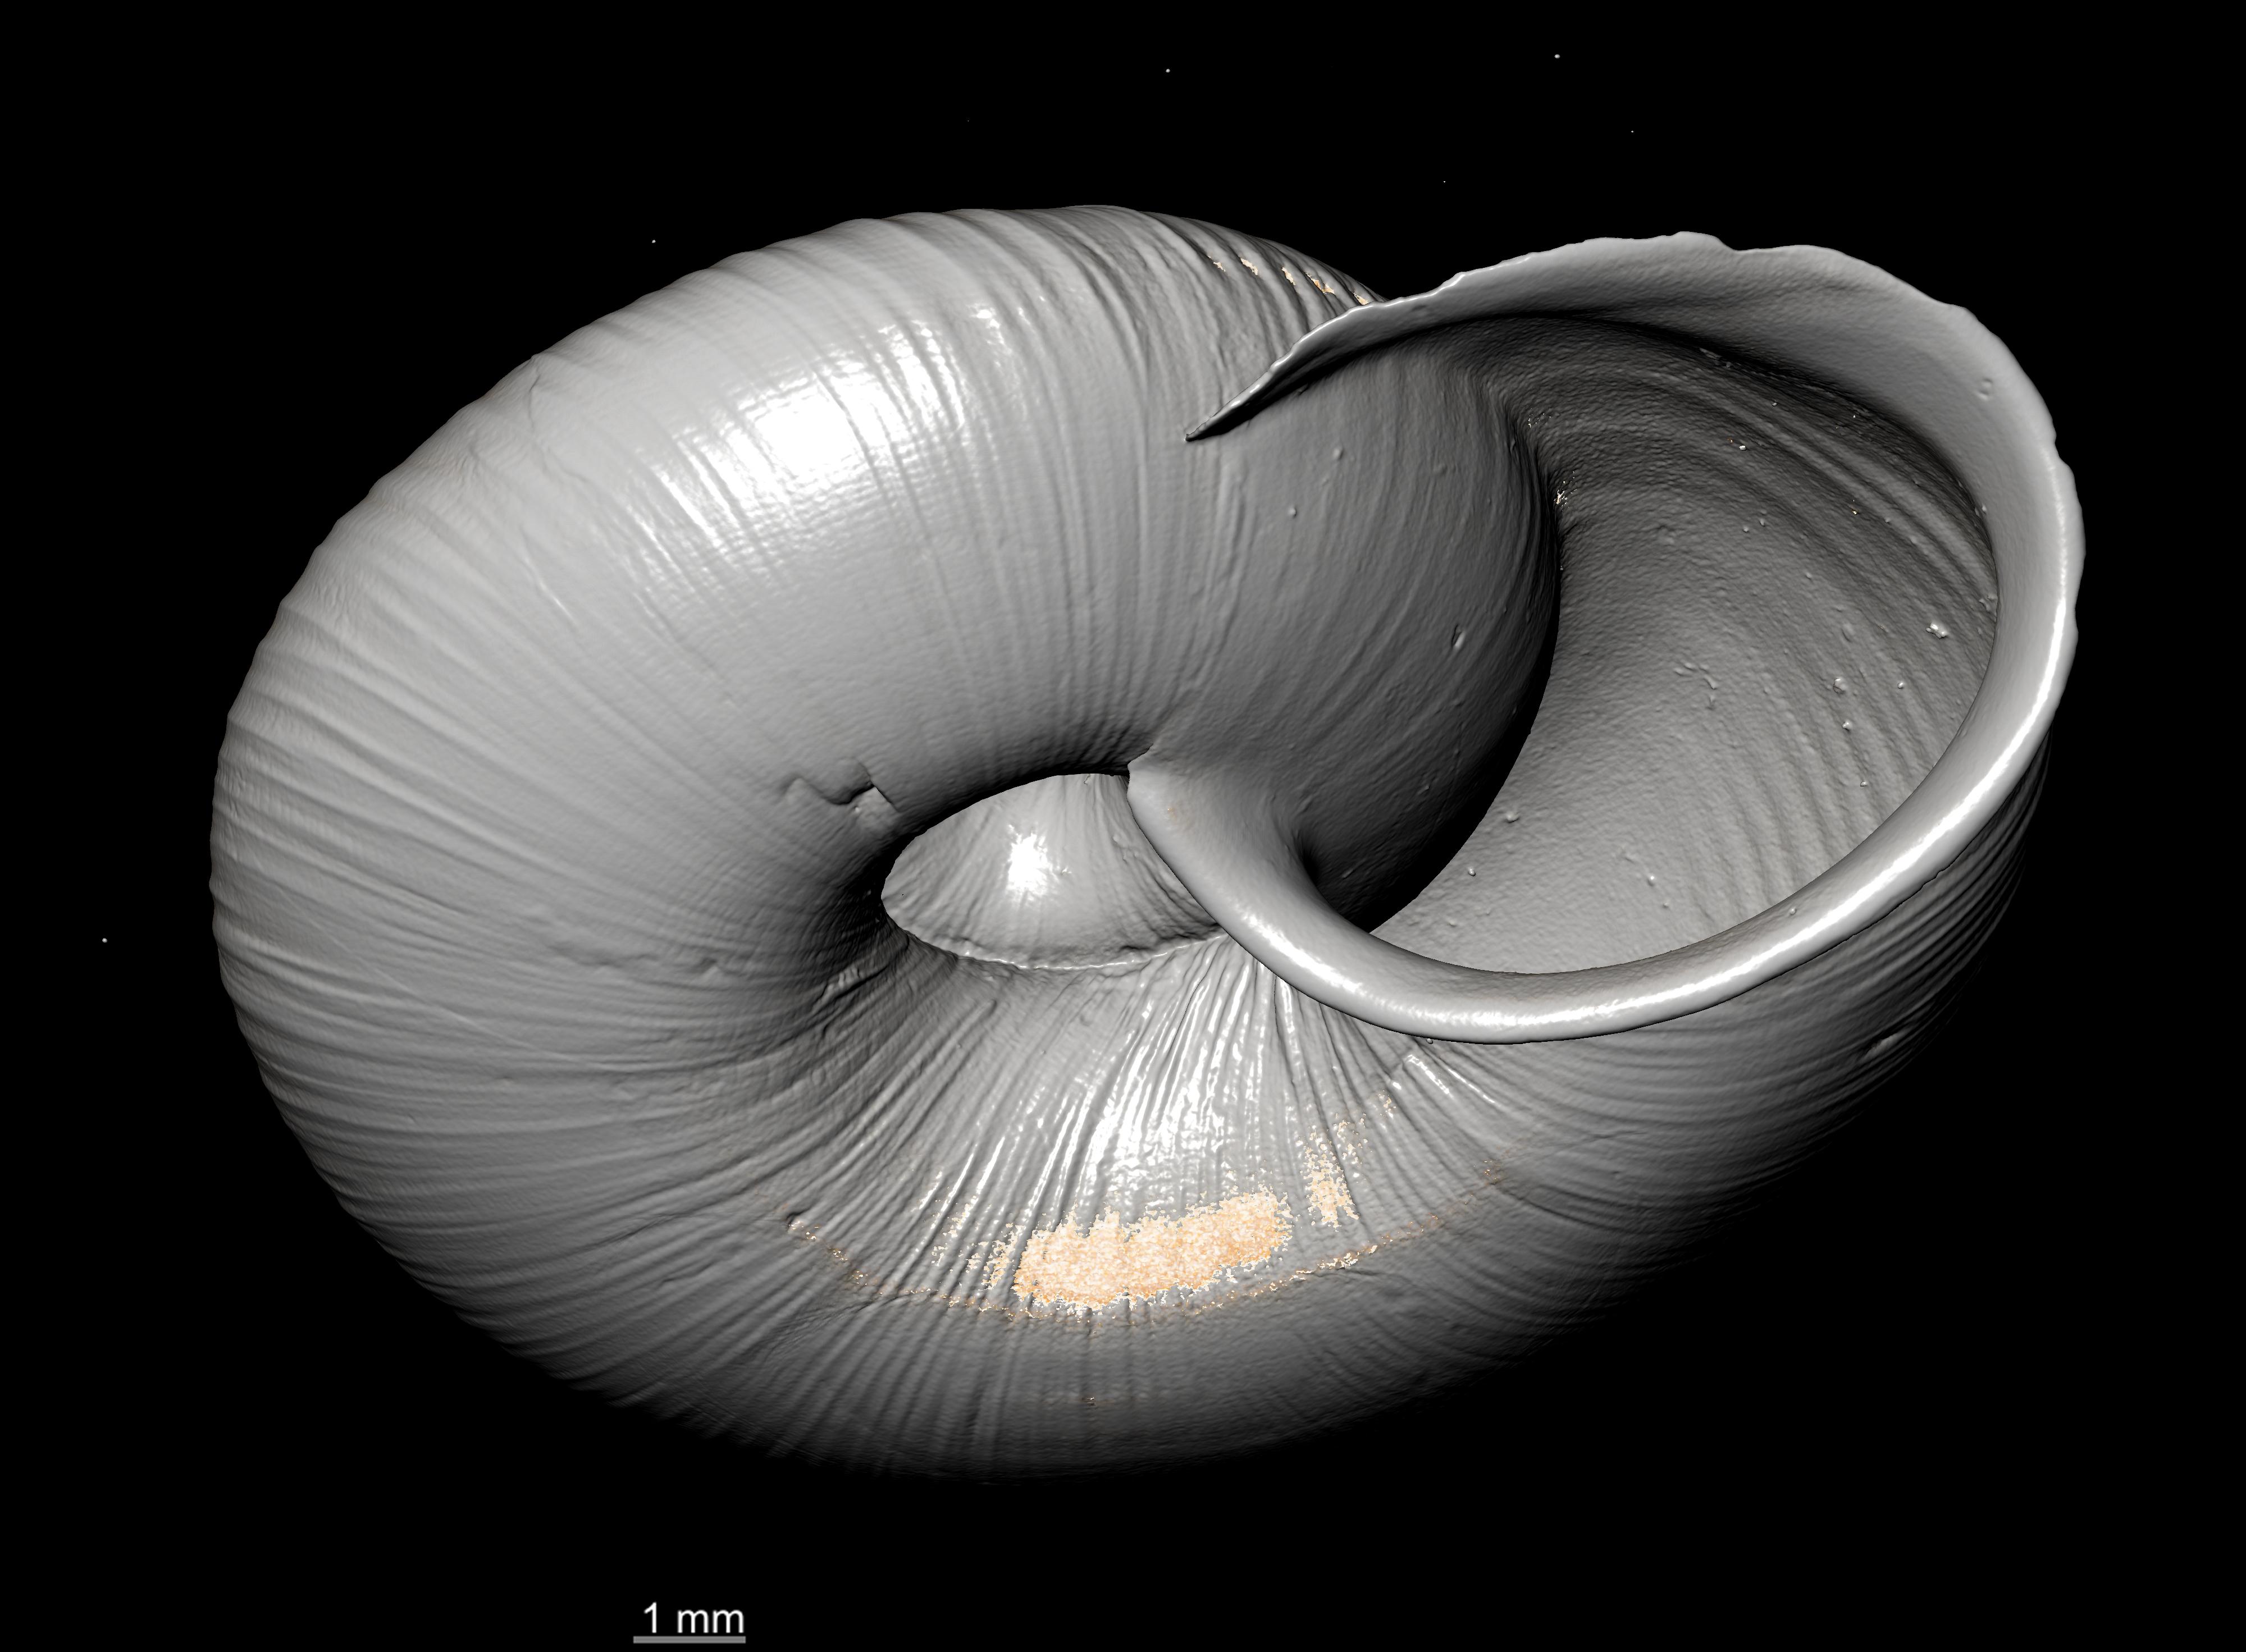 BE-RBINS-INV SYNTYPE MT 2394 Helix (Aegista) packhaensis var. rufula MCT XRE PLANE APERTURE.jpg